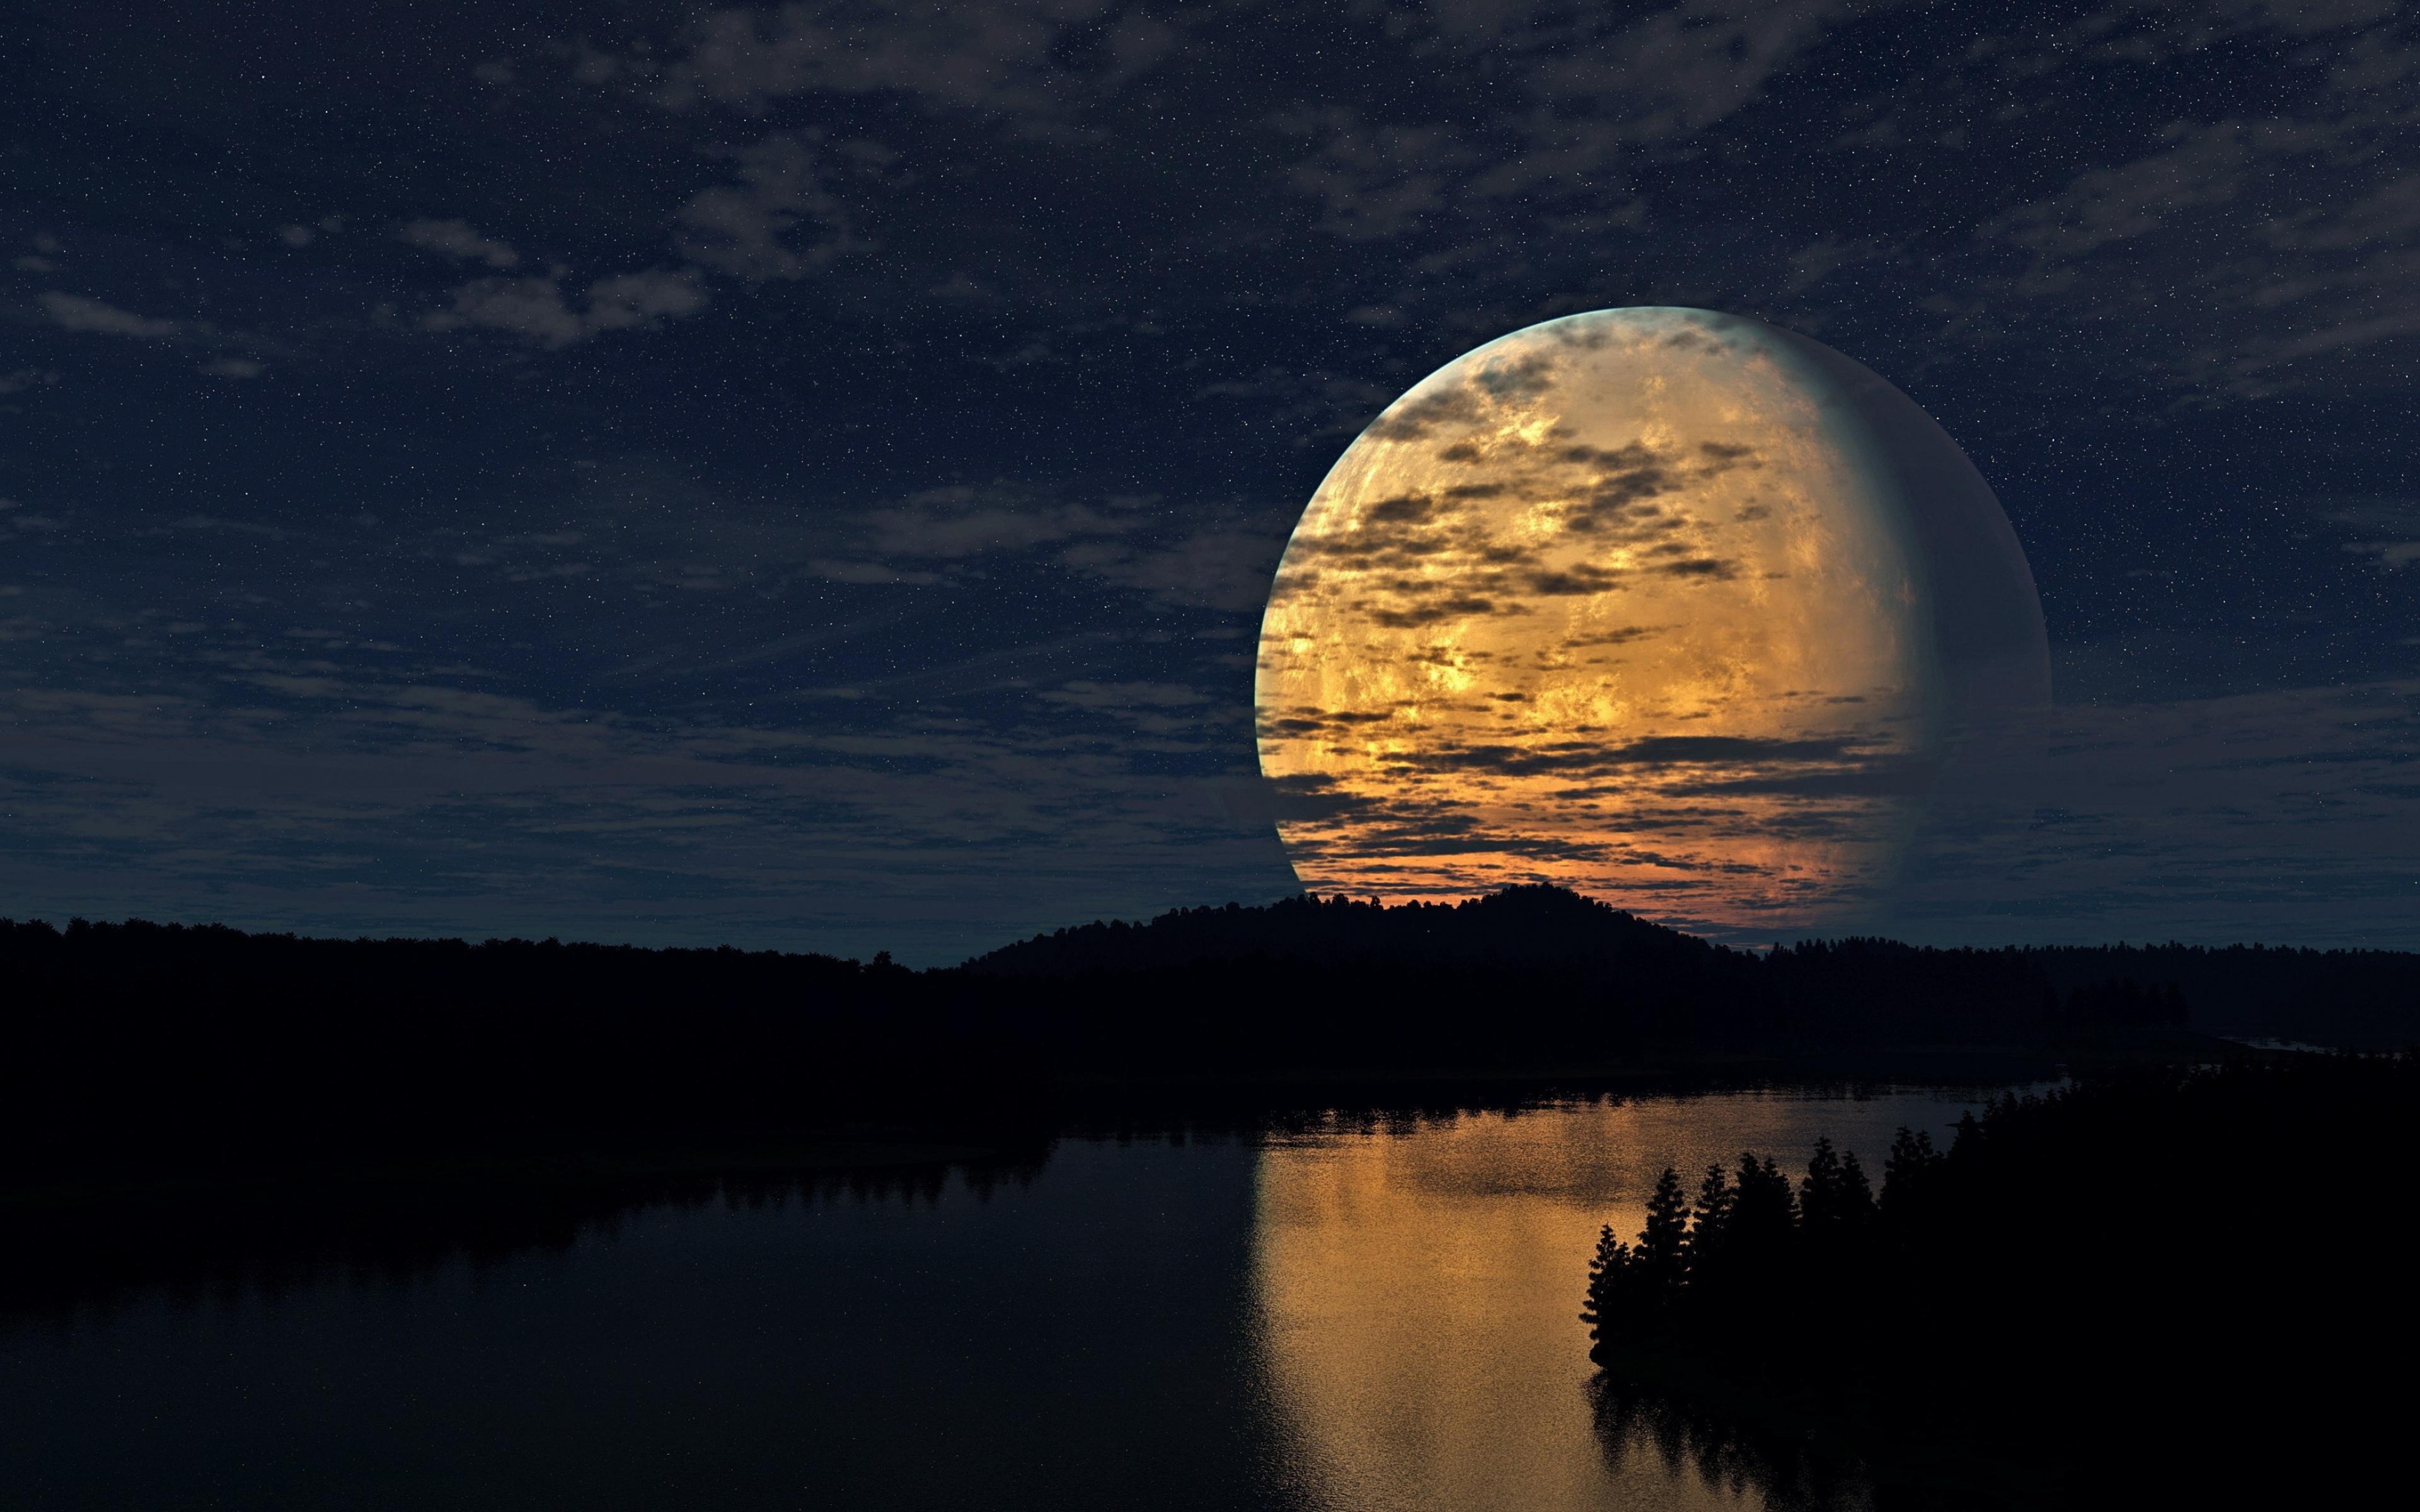 night-sky-moon-river-reflection.jpg